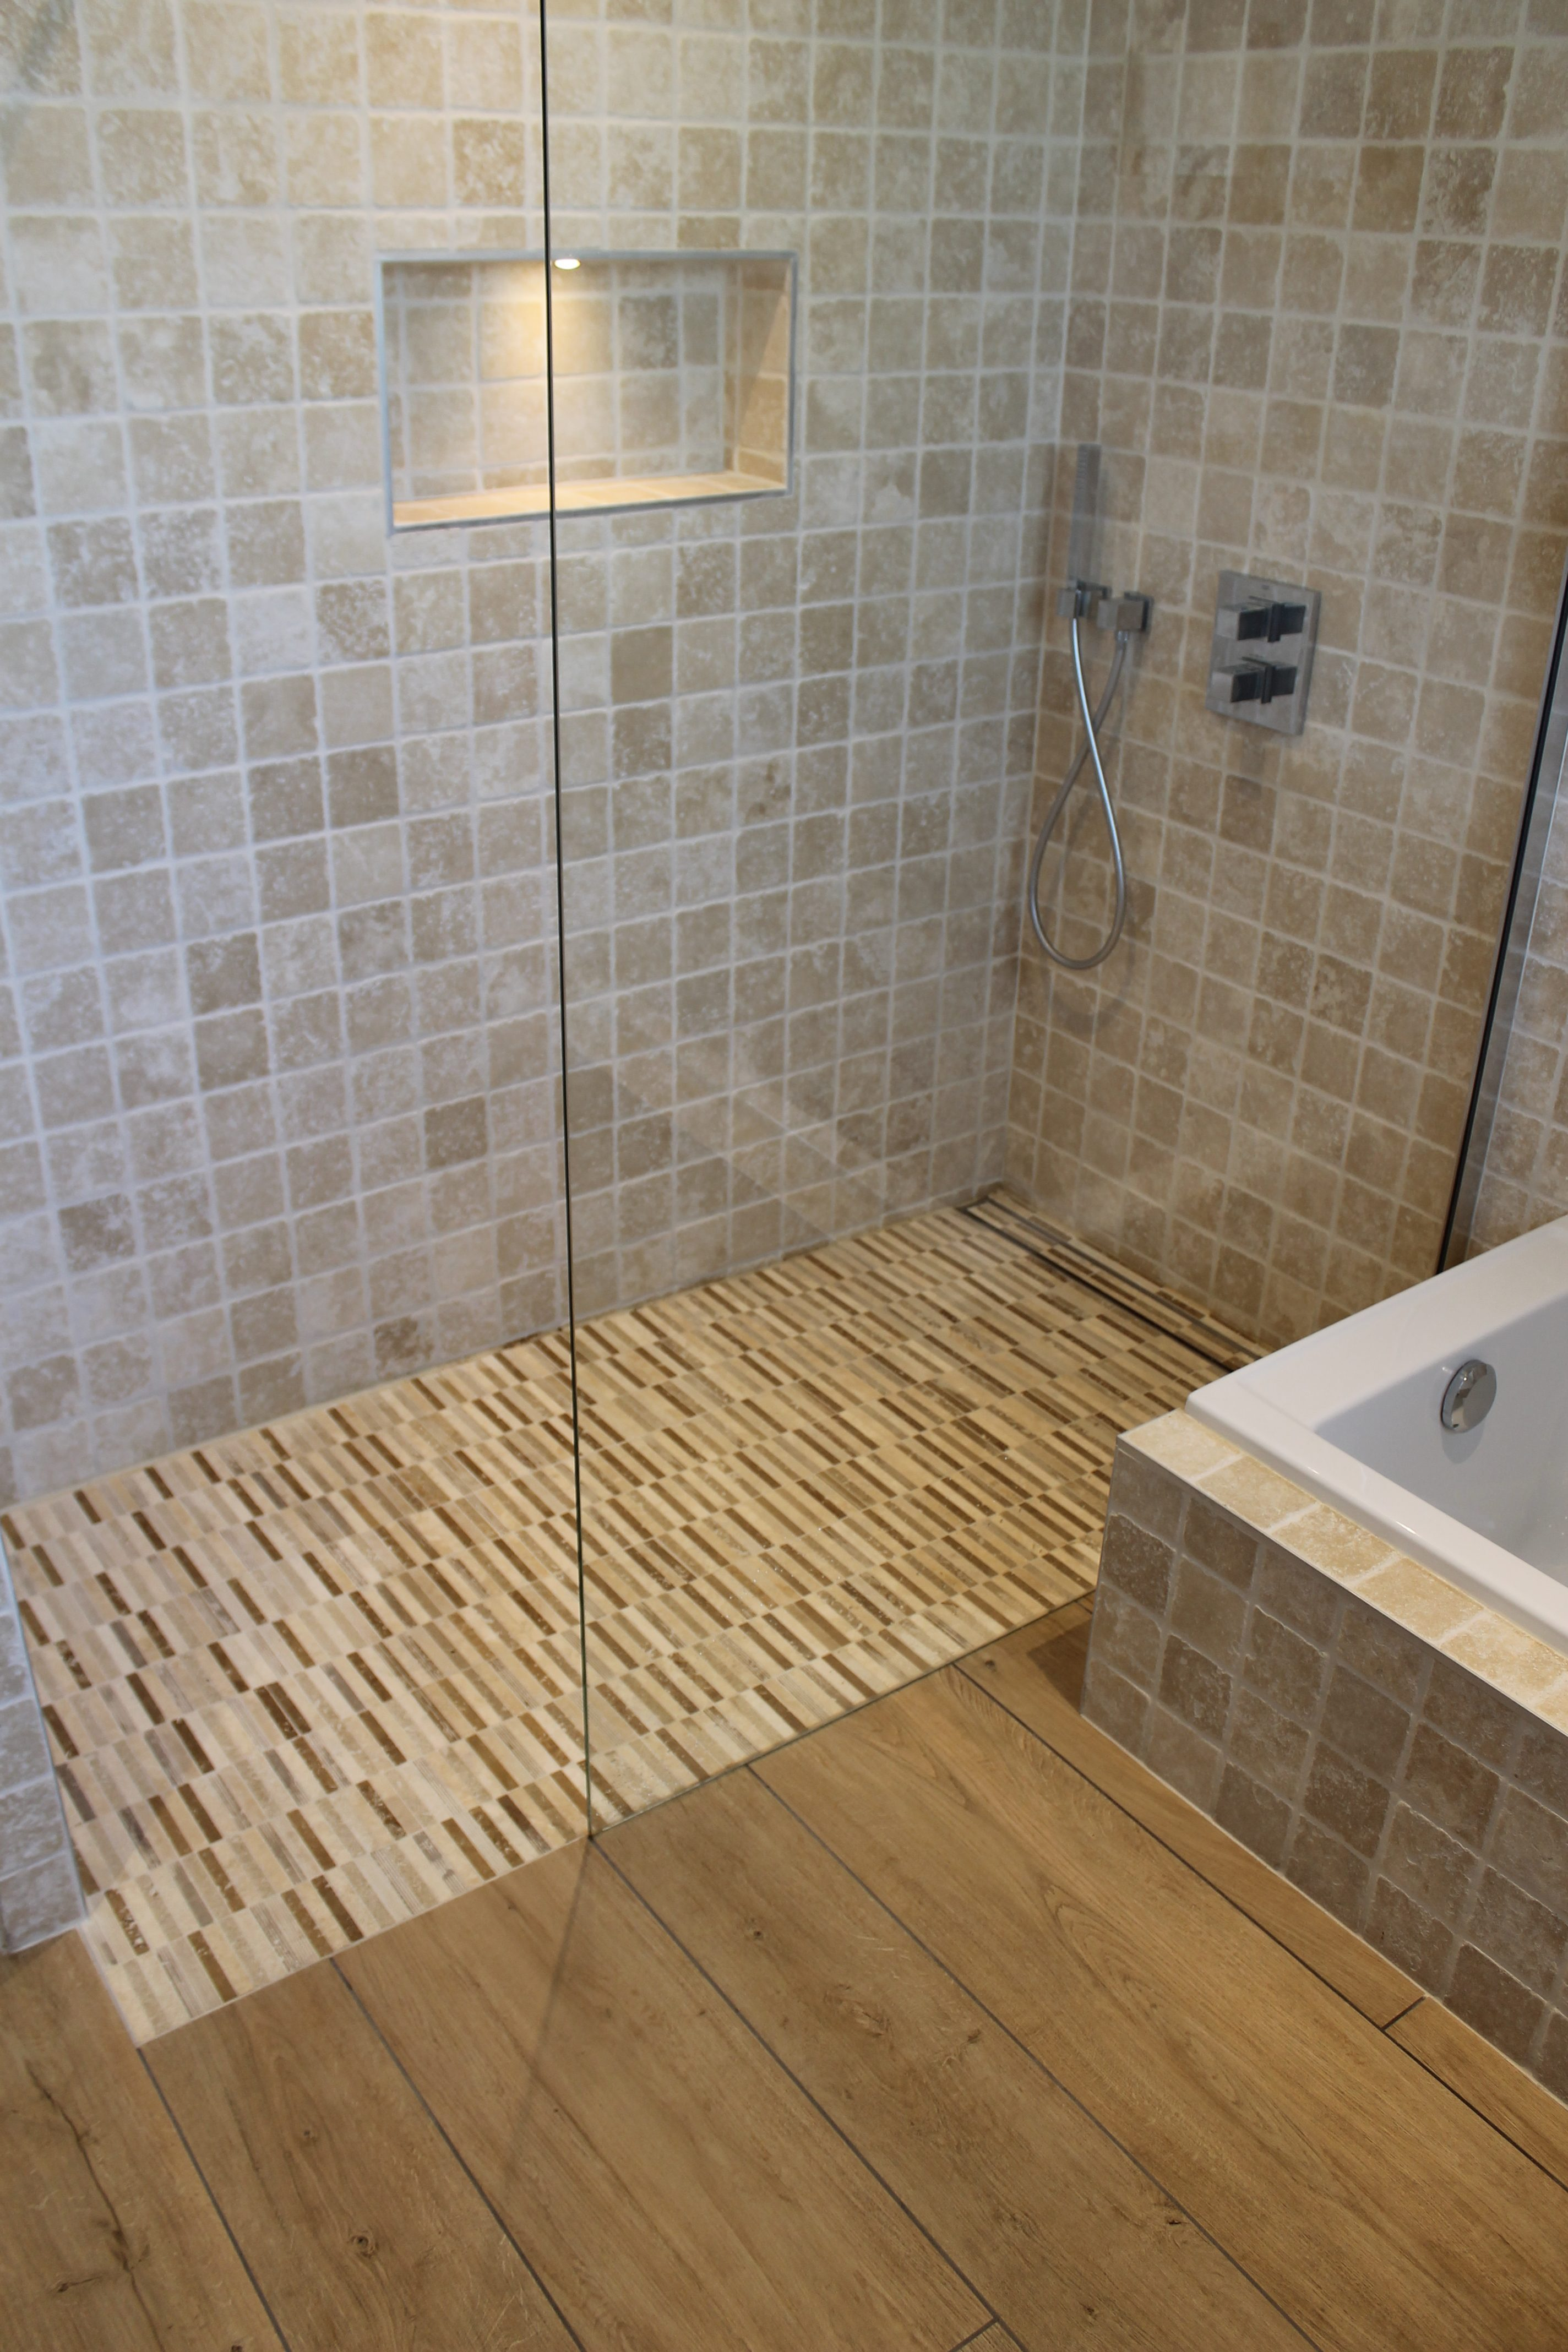 r alisation d une salle de bain inzinzac lochrist an. Black Bedroom Furniture Sets. Home Design Ideas